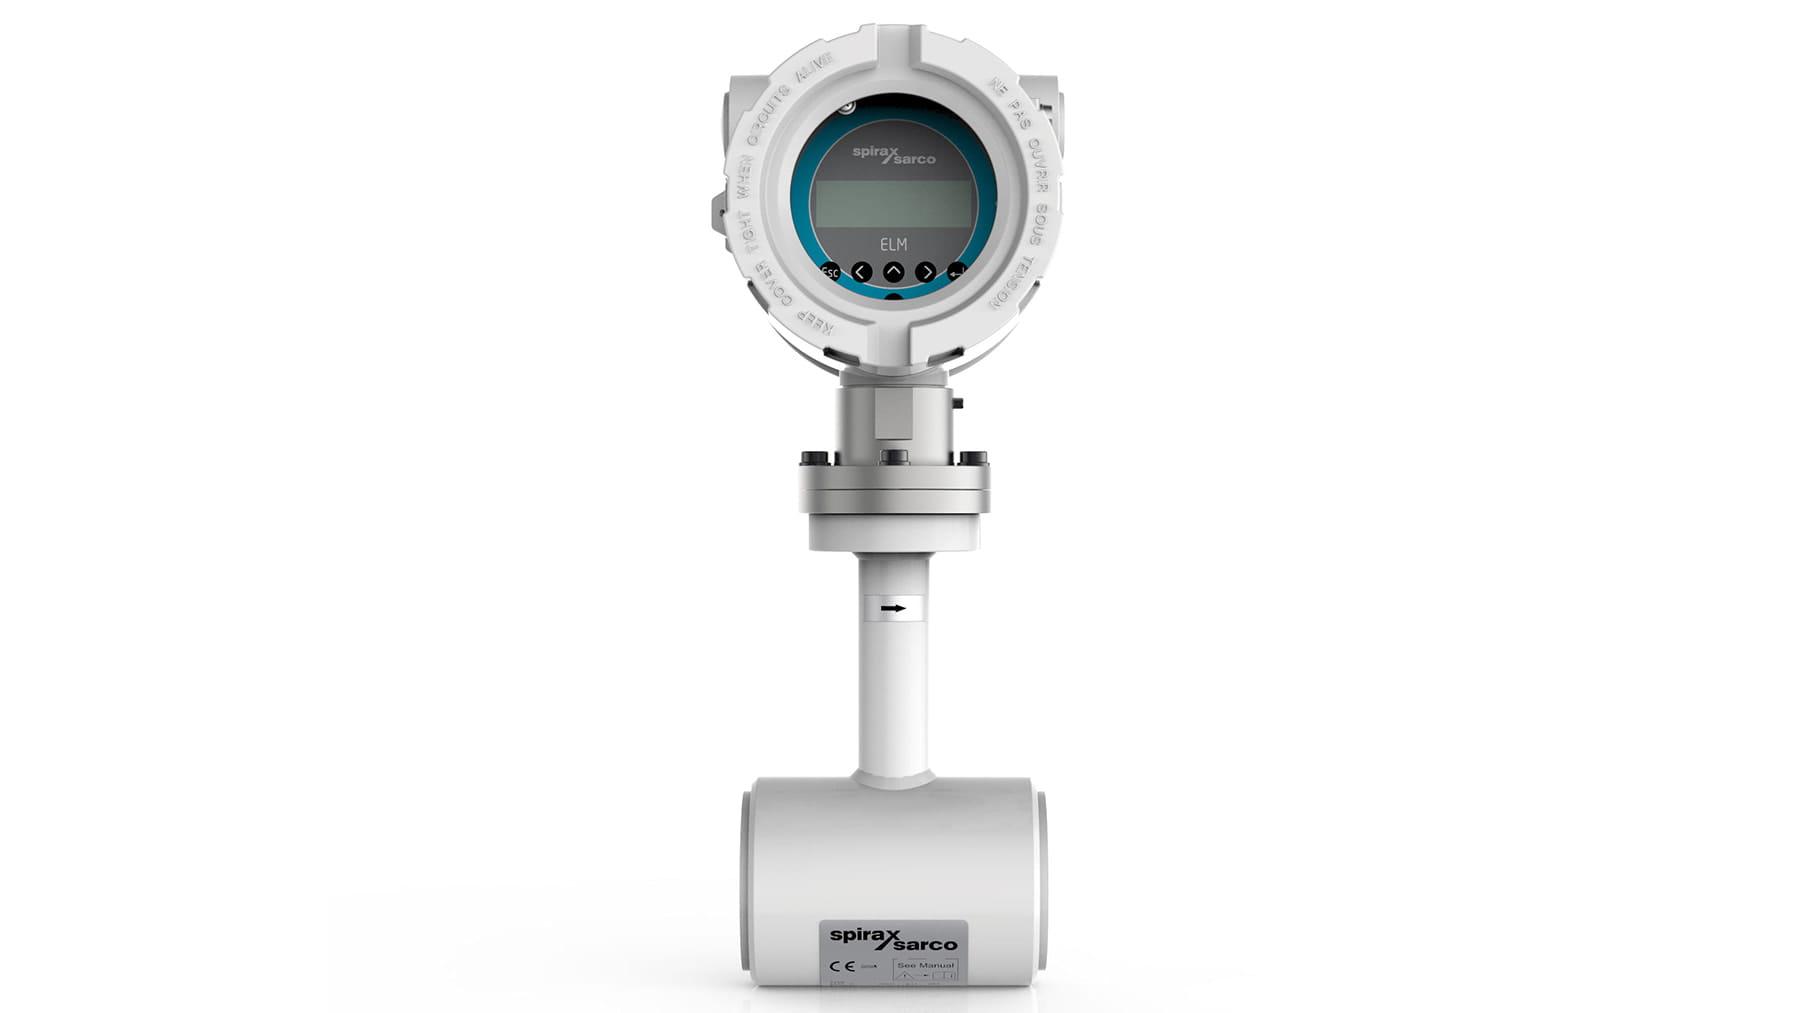 ELM Electromagnetic flowmeter